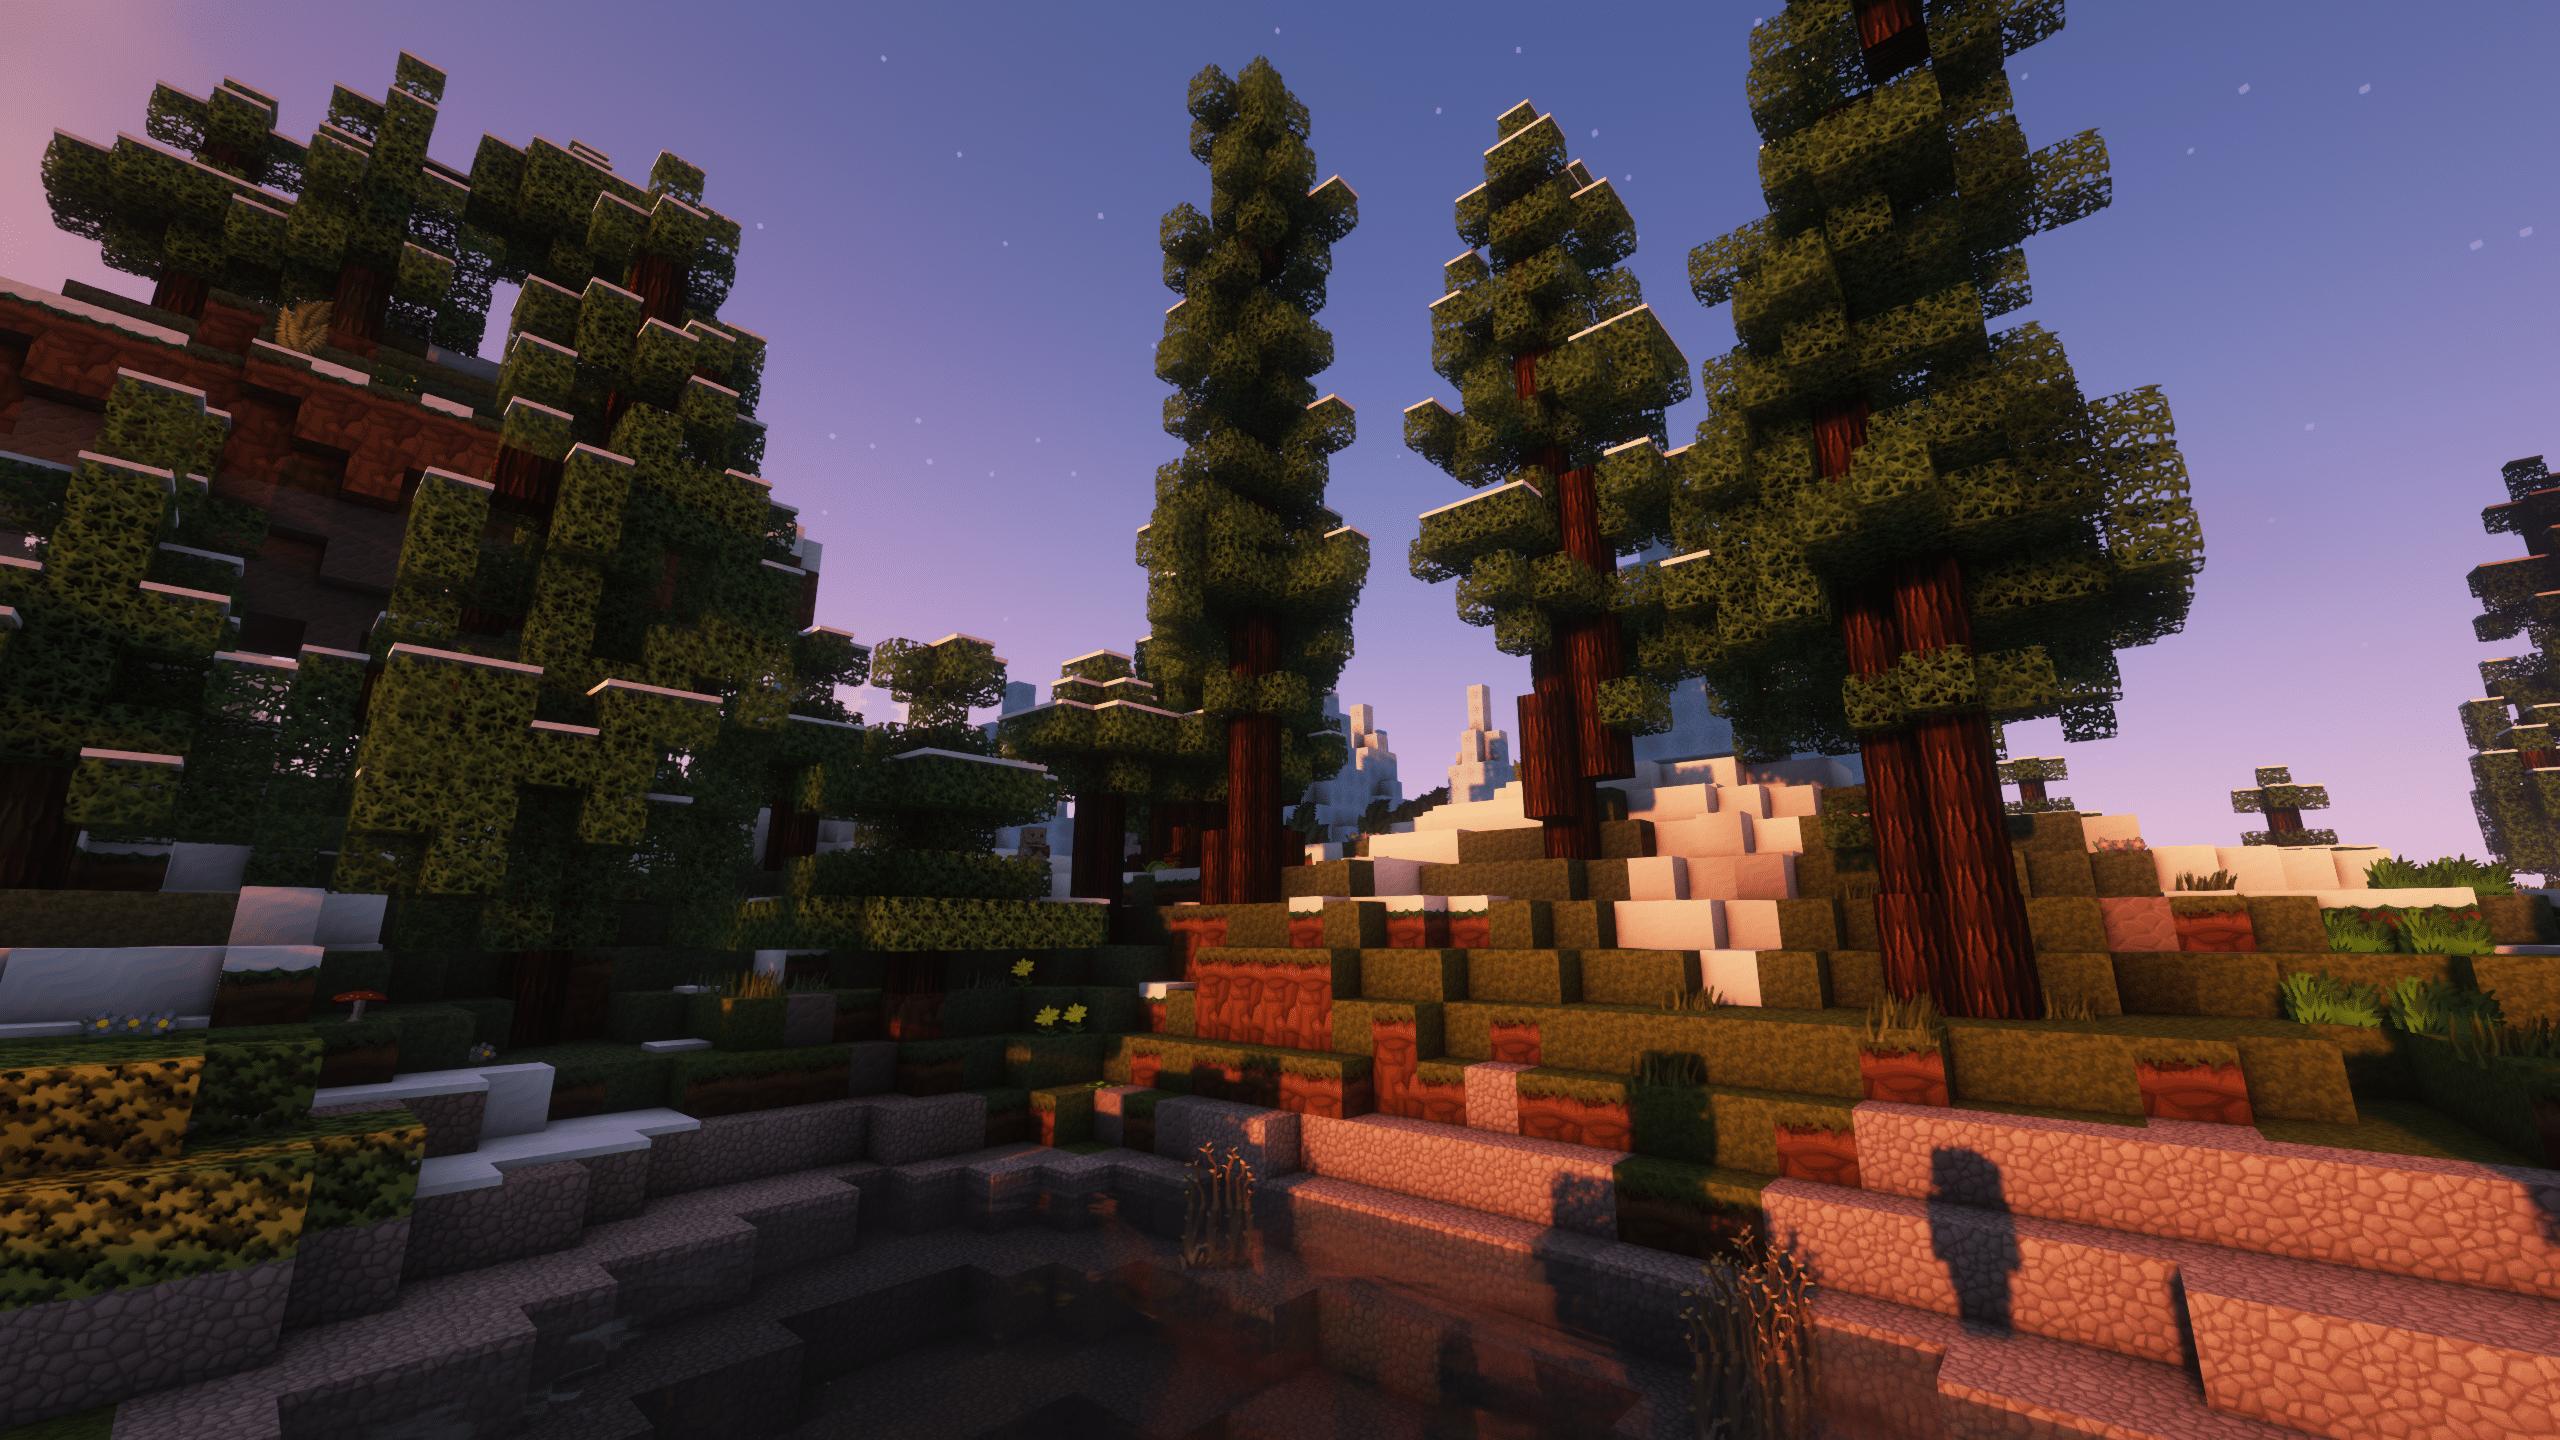 Minecraft Enigmatica 2: Shadows at Sunset